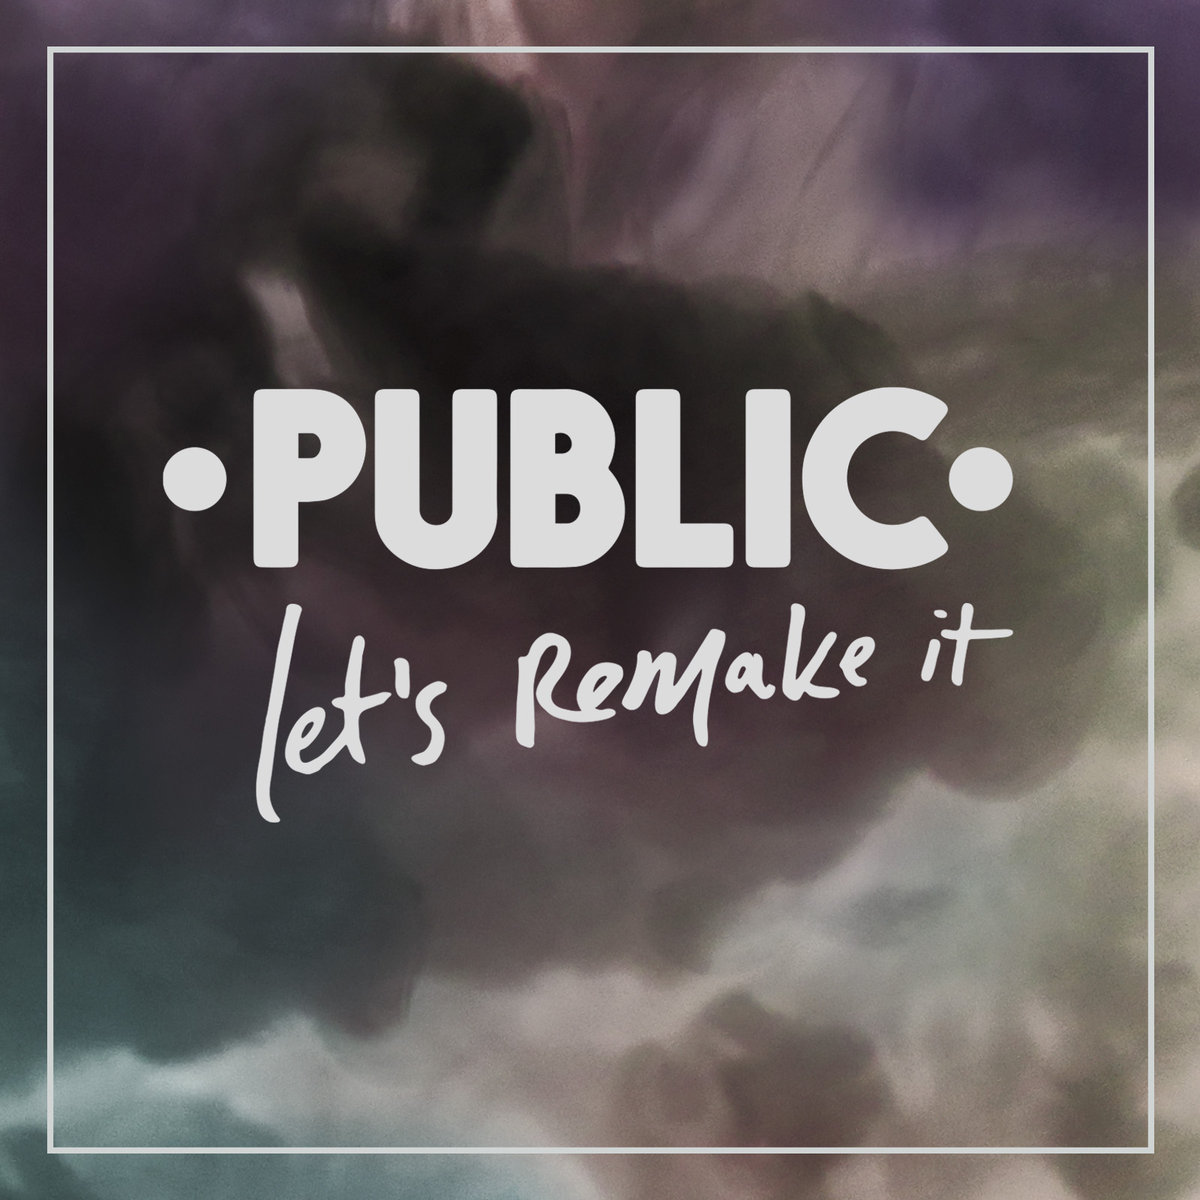 Let's Remake It